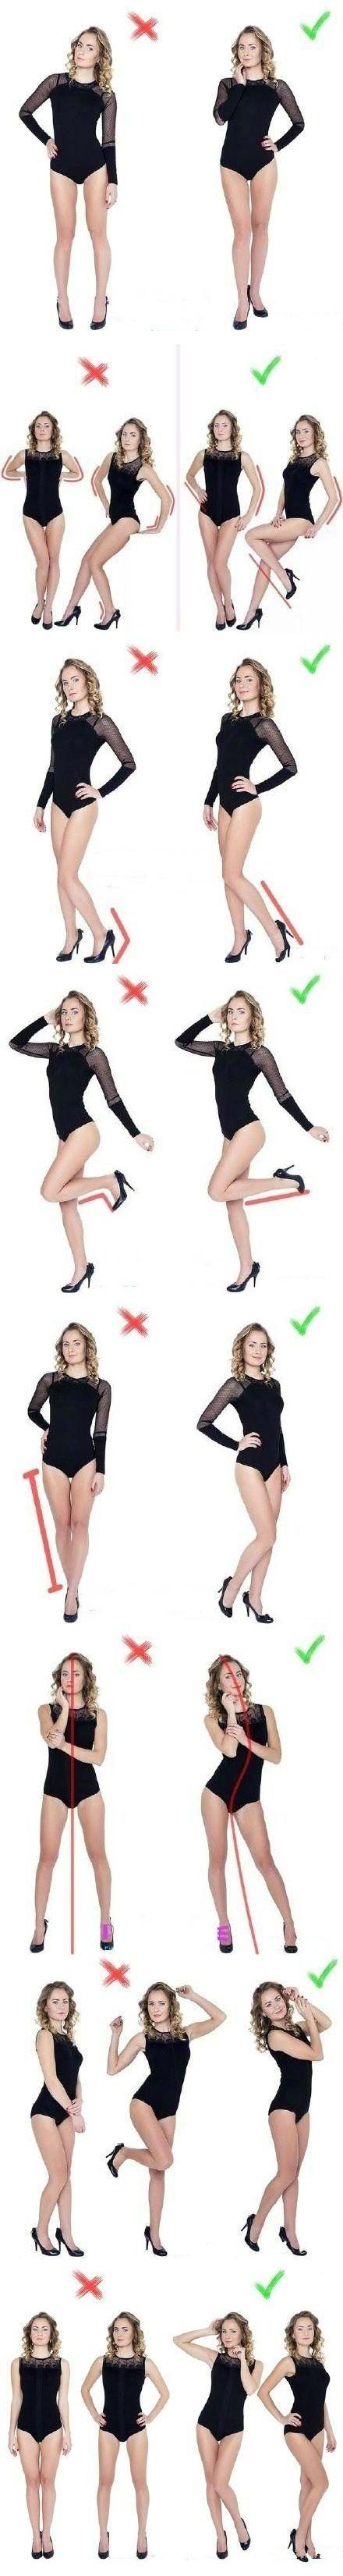 Posing - correctly vs incorrectly